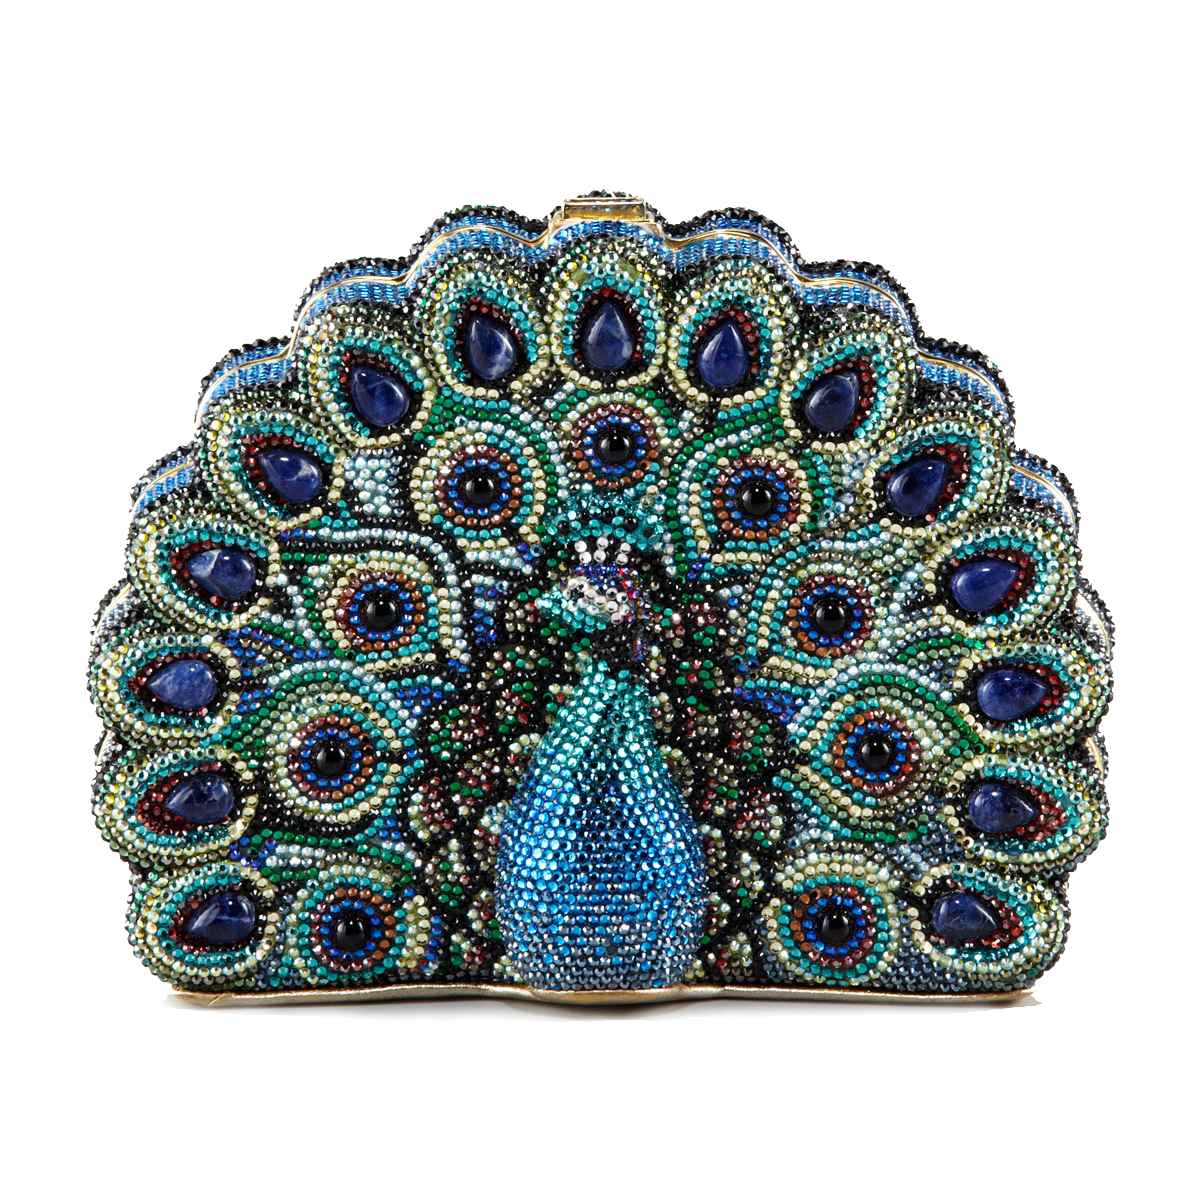 judith-leiber-multi-peacock-clutch-product-1-4237216-829227177.jpeg